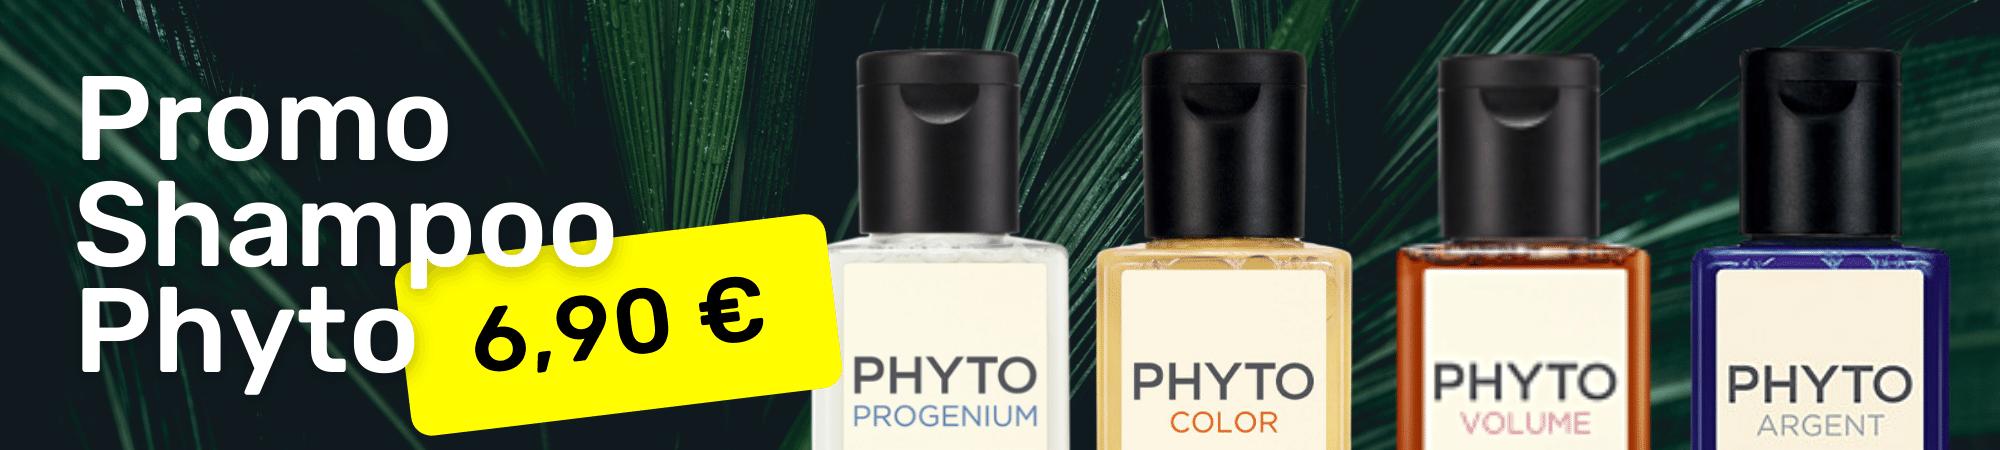 Shampoo Phyto in Offerta a 6,90€